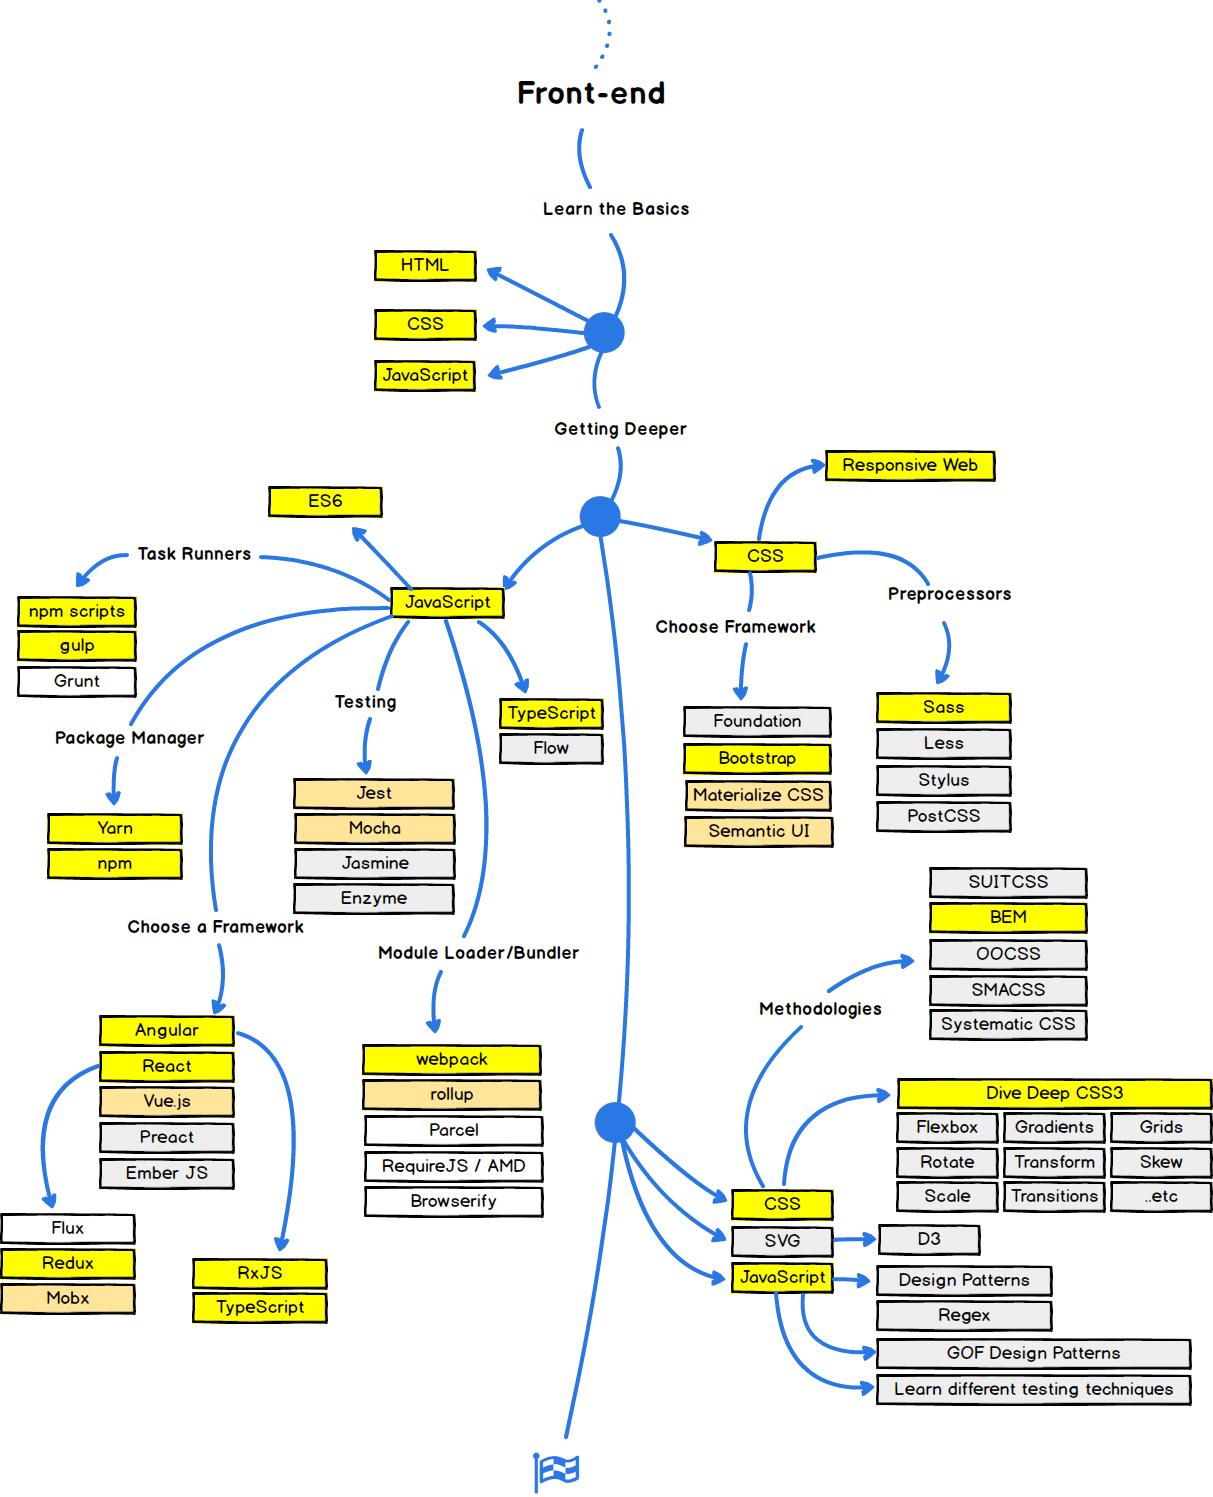 front end diagram reversing motor starter the 2018 web developer roadmap codeburst frontend path courses for learning